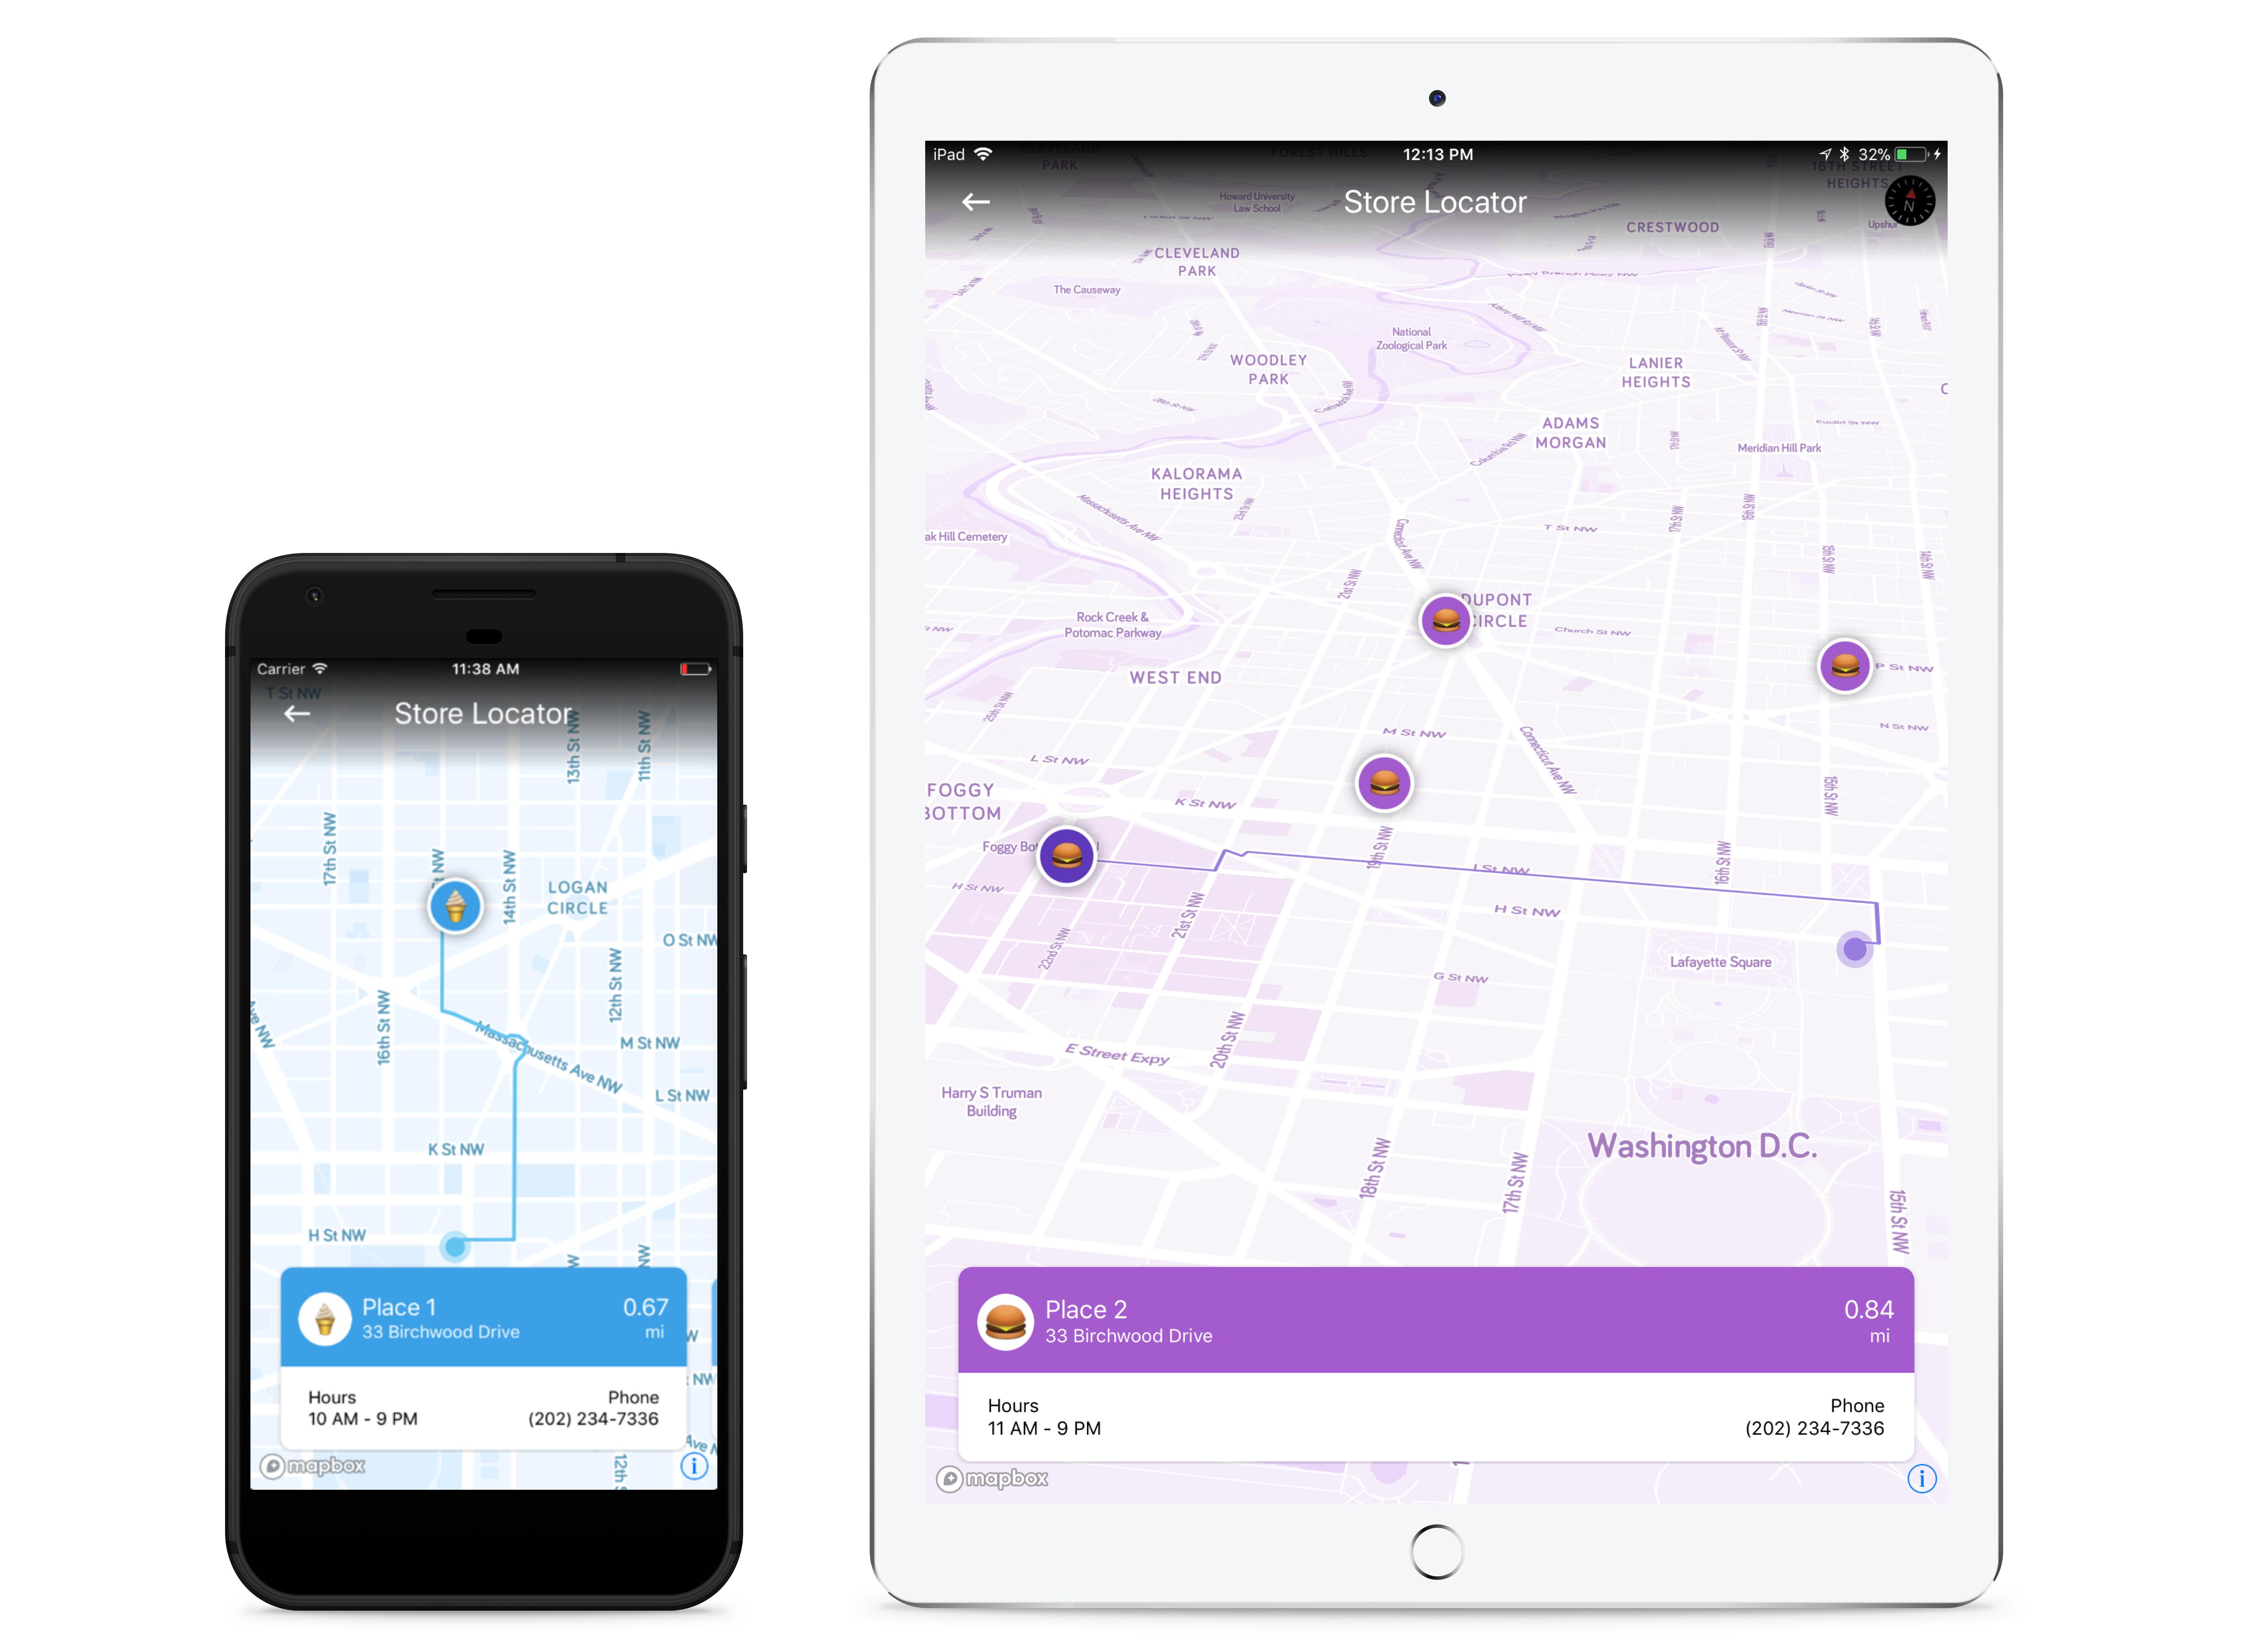 GitHub - mapbox/store-locator-react-native: A plug-and-play